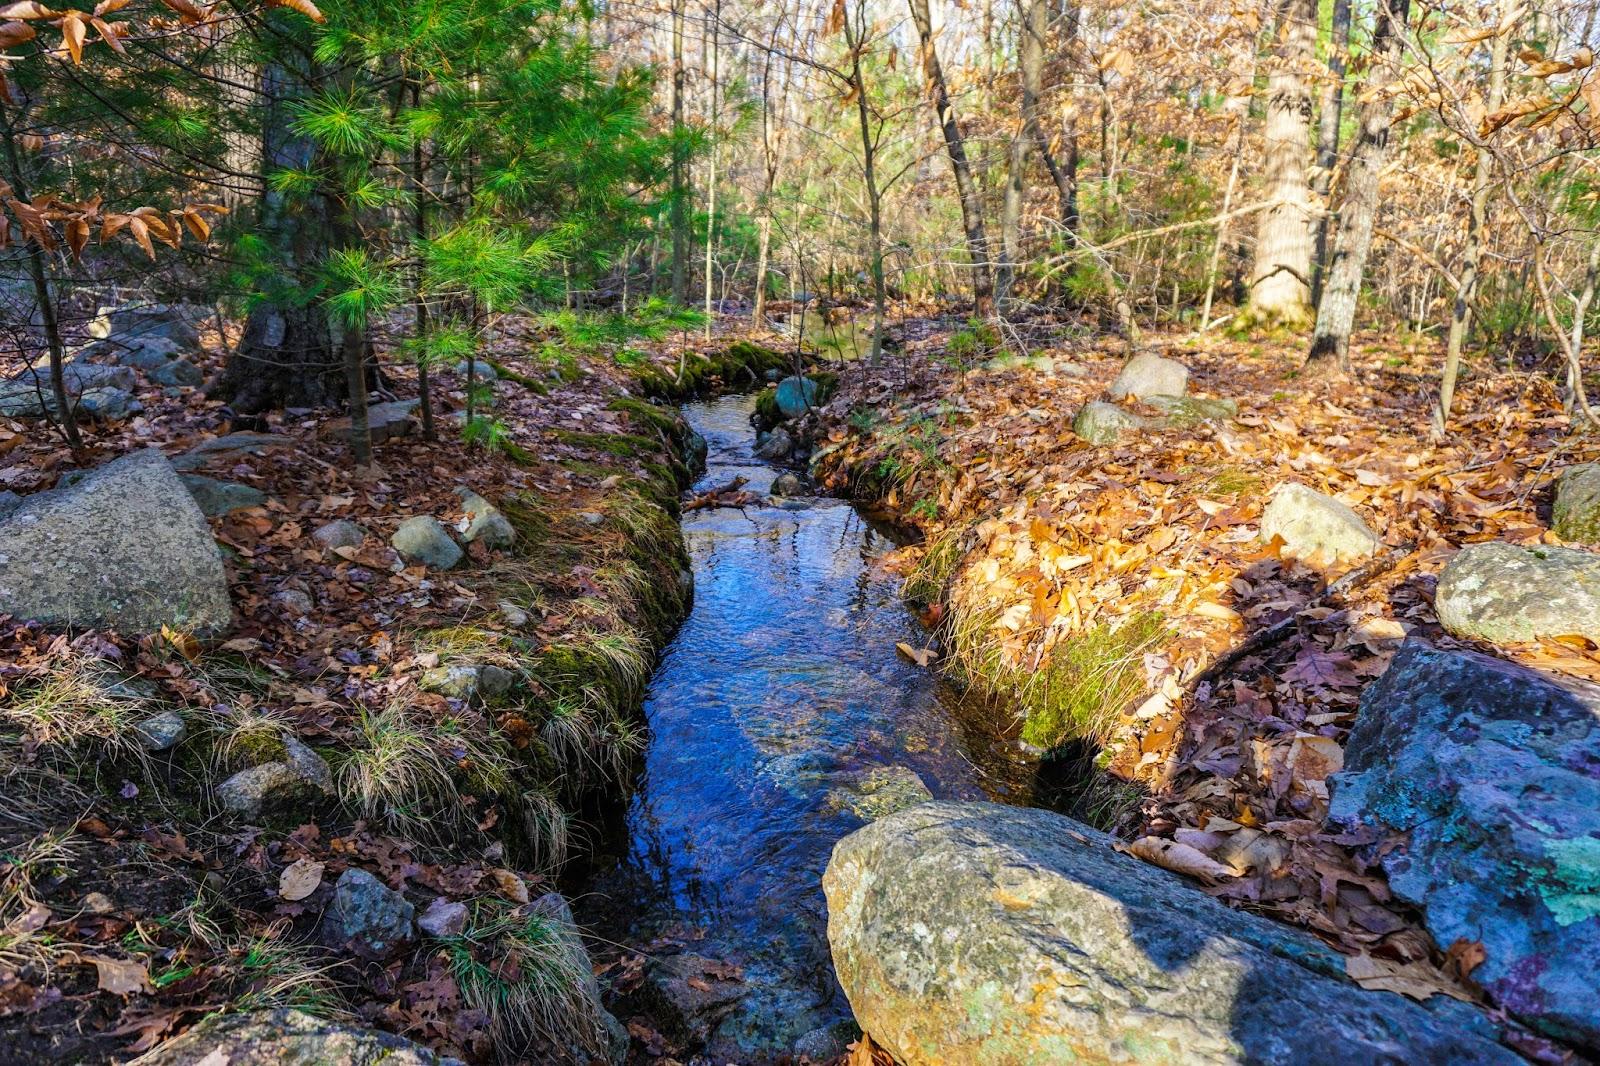 Weir-Farm-and-Turkey-Hill-Hingham-MA-Travel-the-East